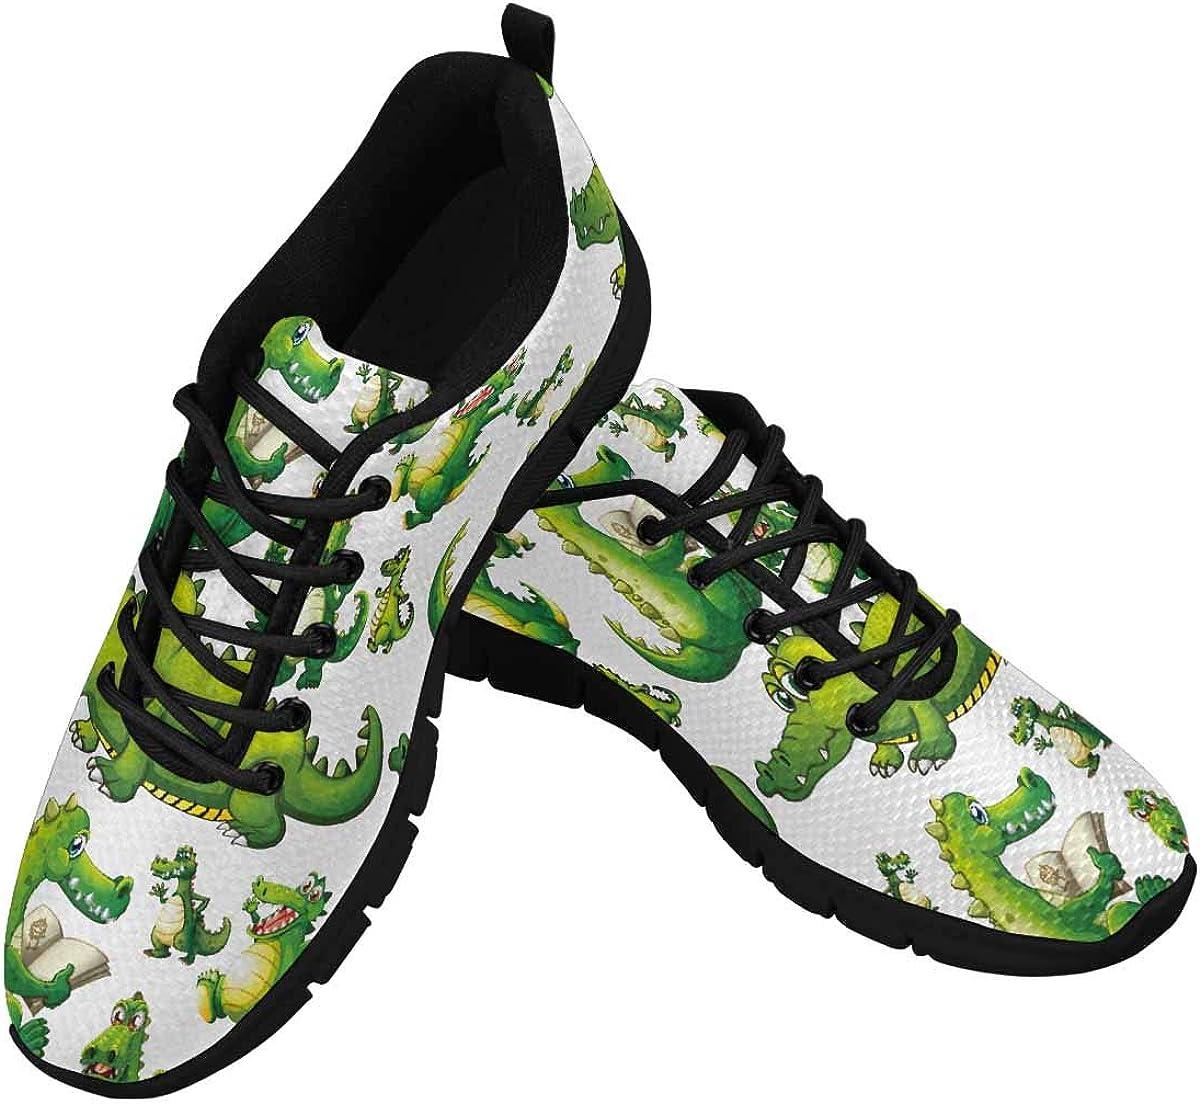 INTERESTPRINT Cute Crocodile Women's Walking Shoes Lightweight Casual Running Sneakers